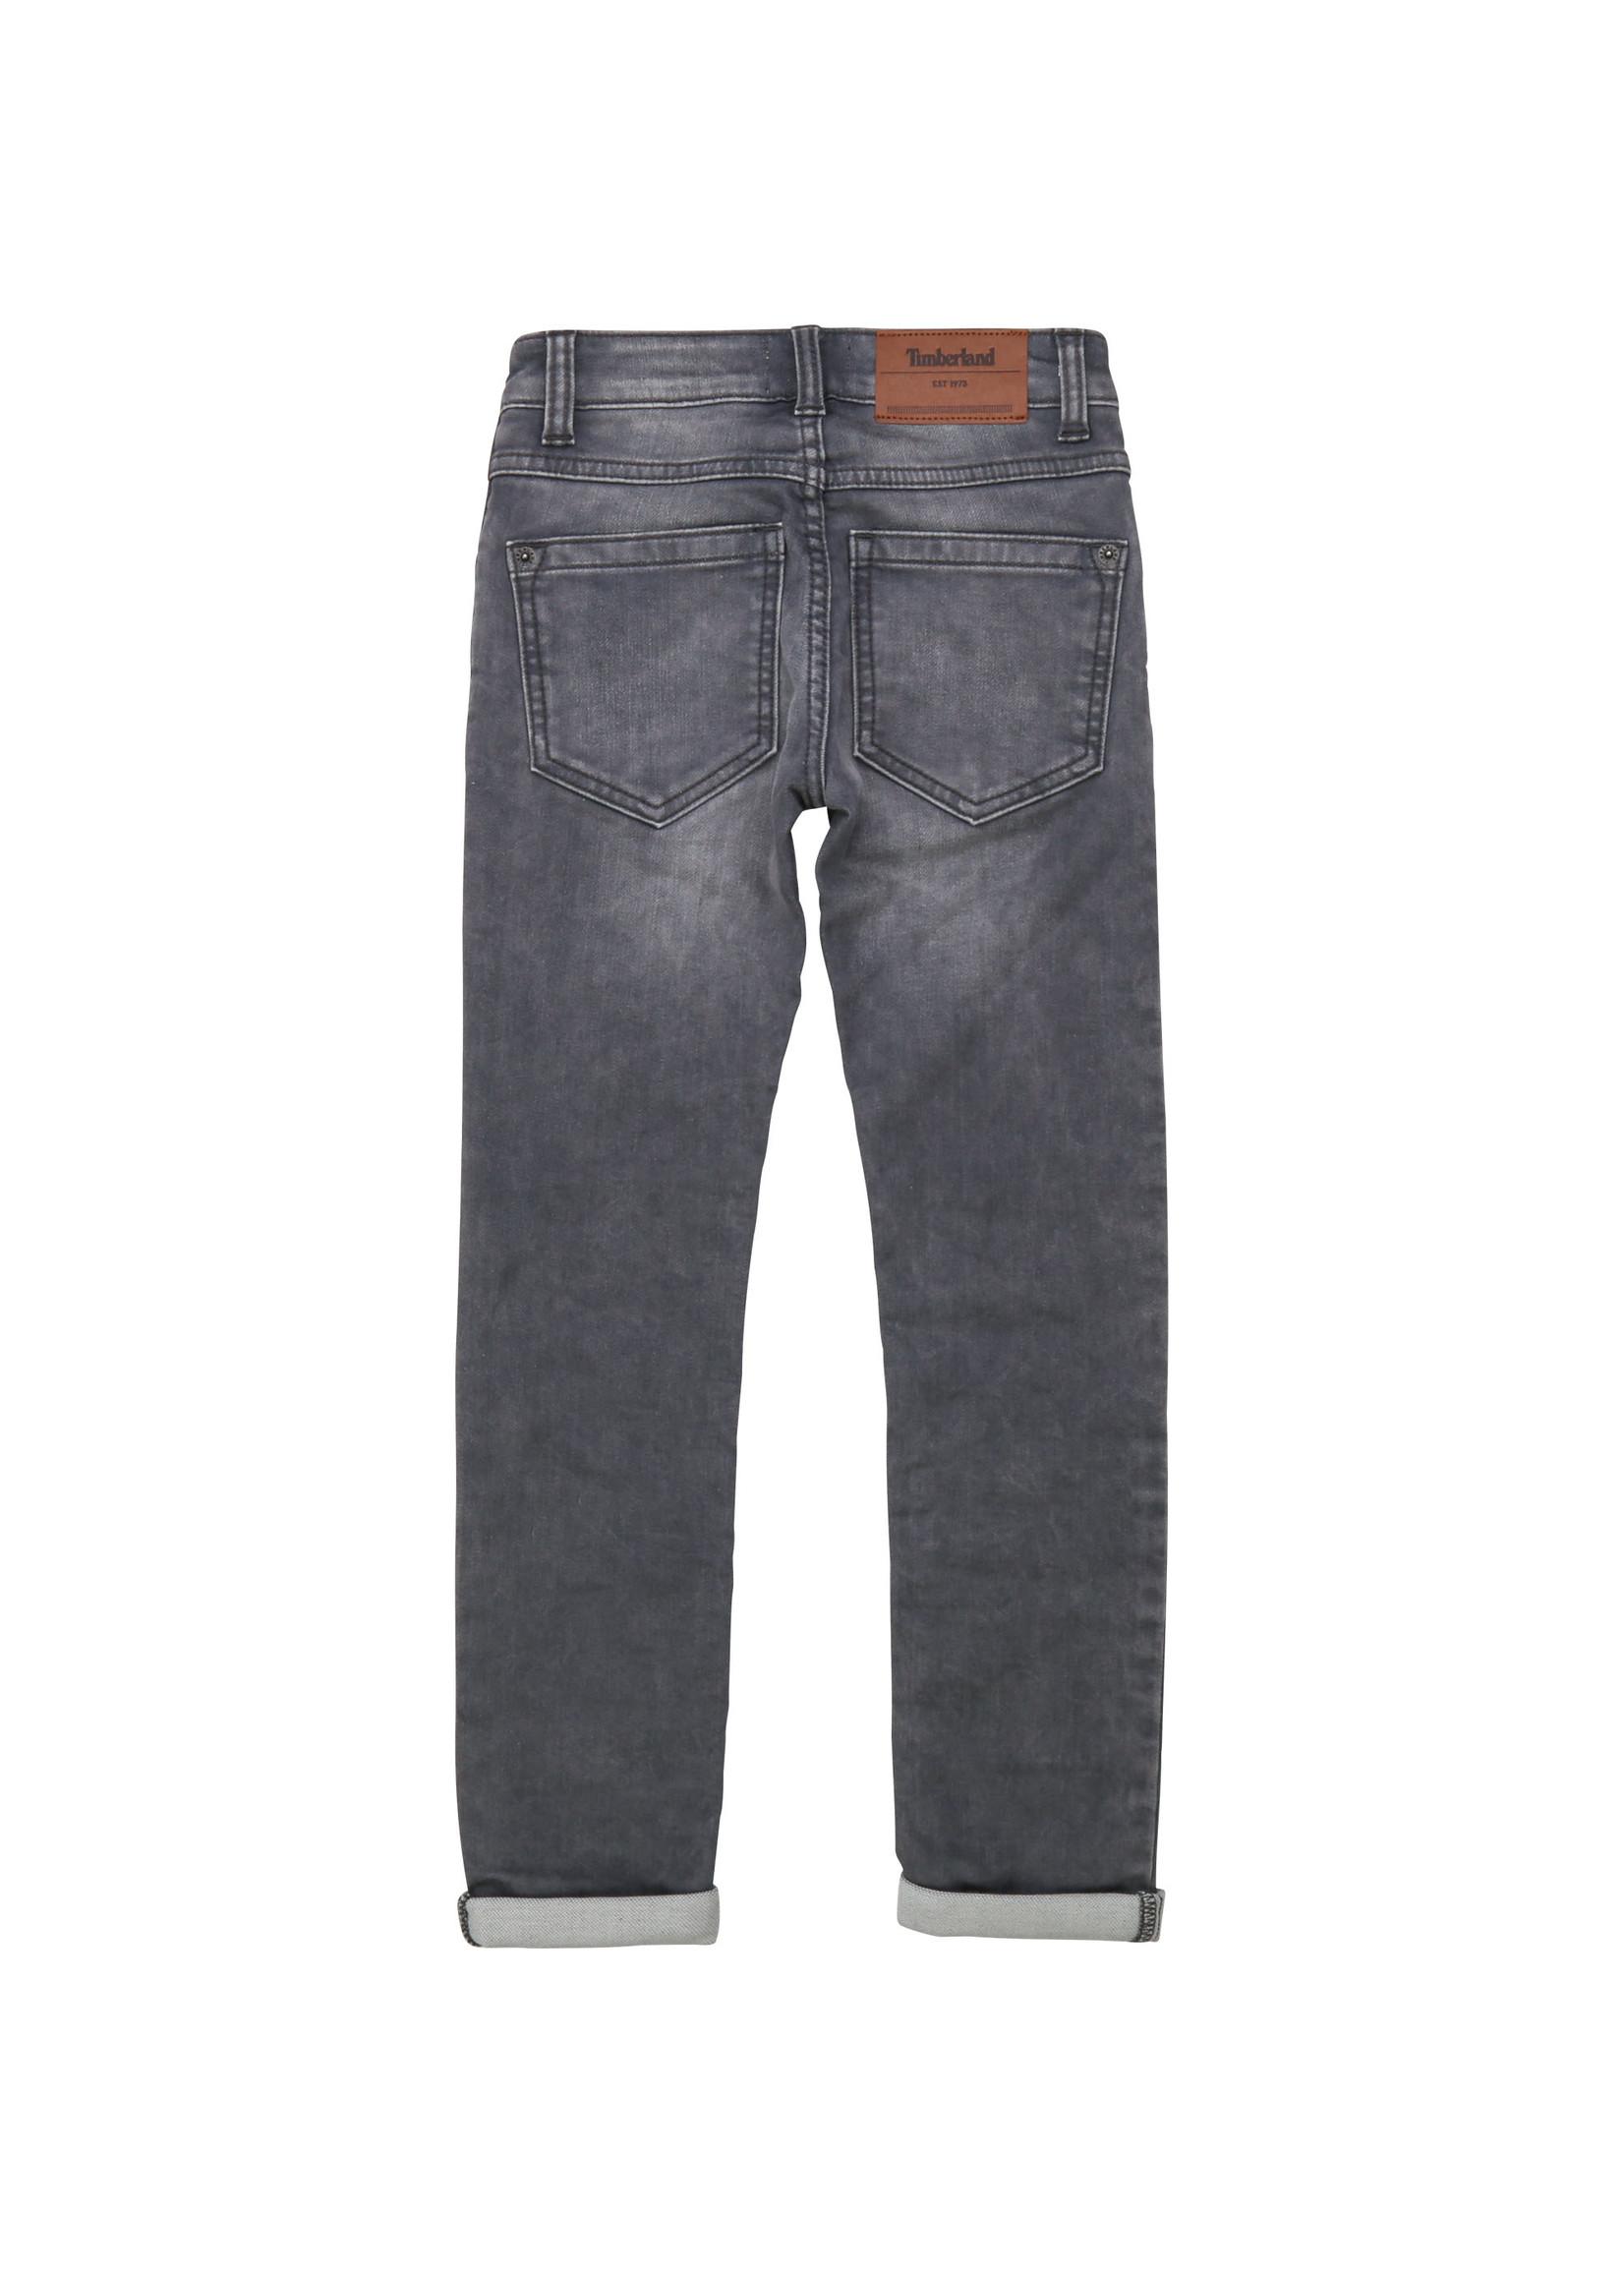 Timberland TIMBERLAND Jeans denim grey